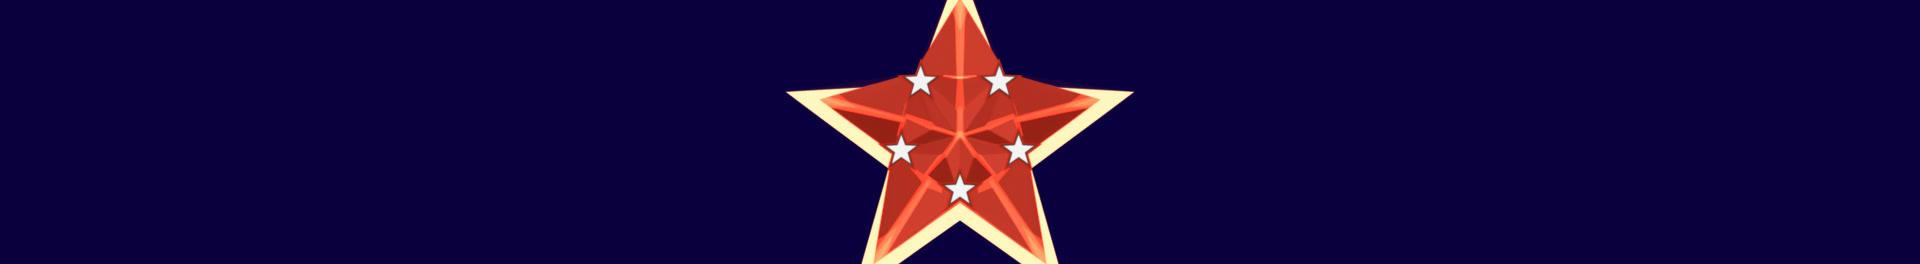 superStar2 full Stock Video Footage